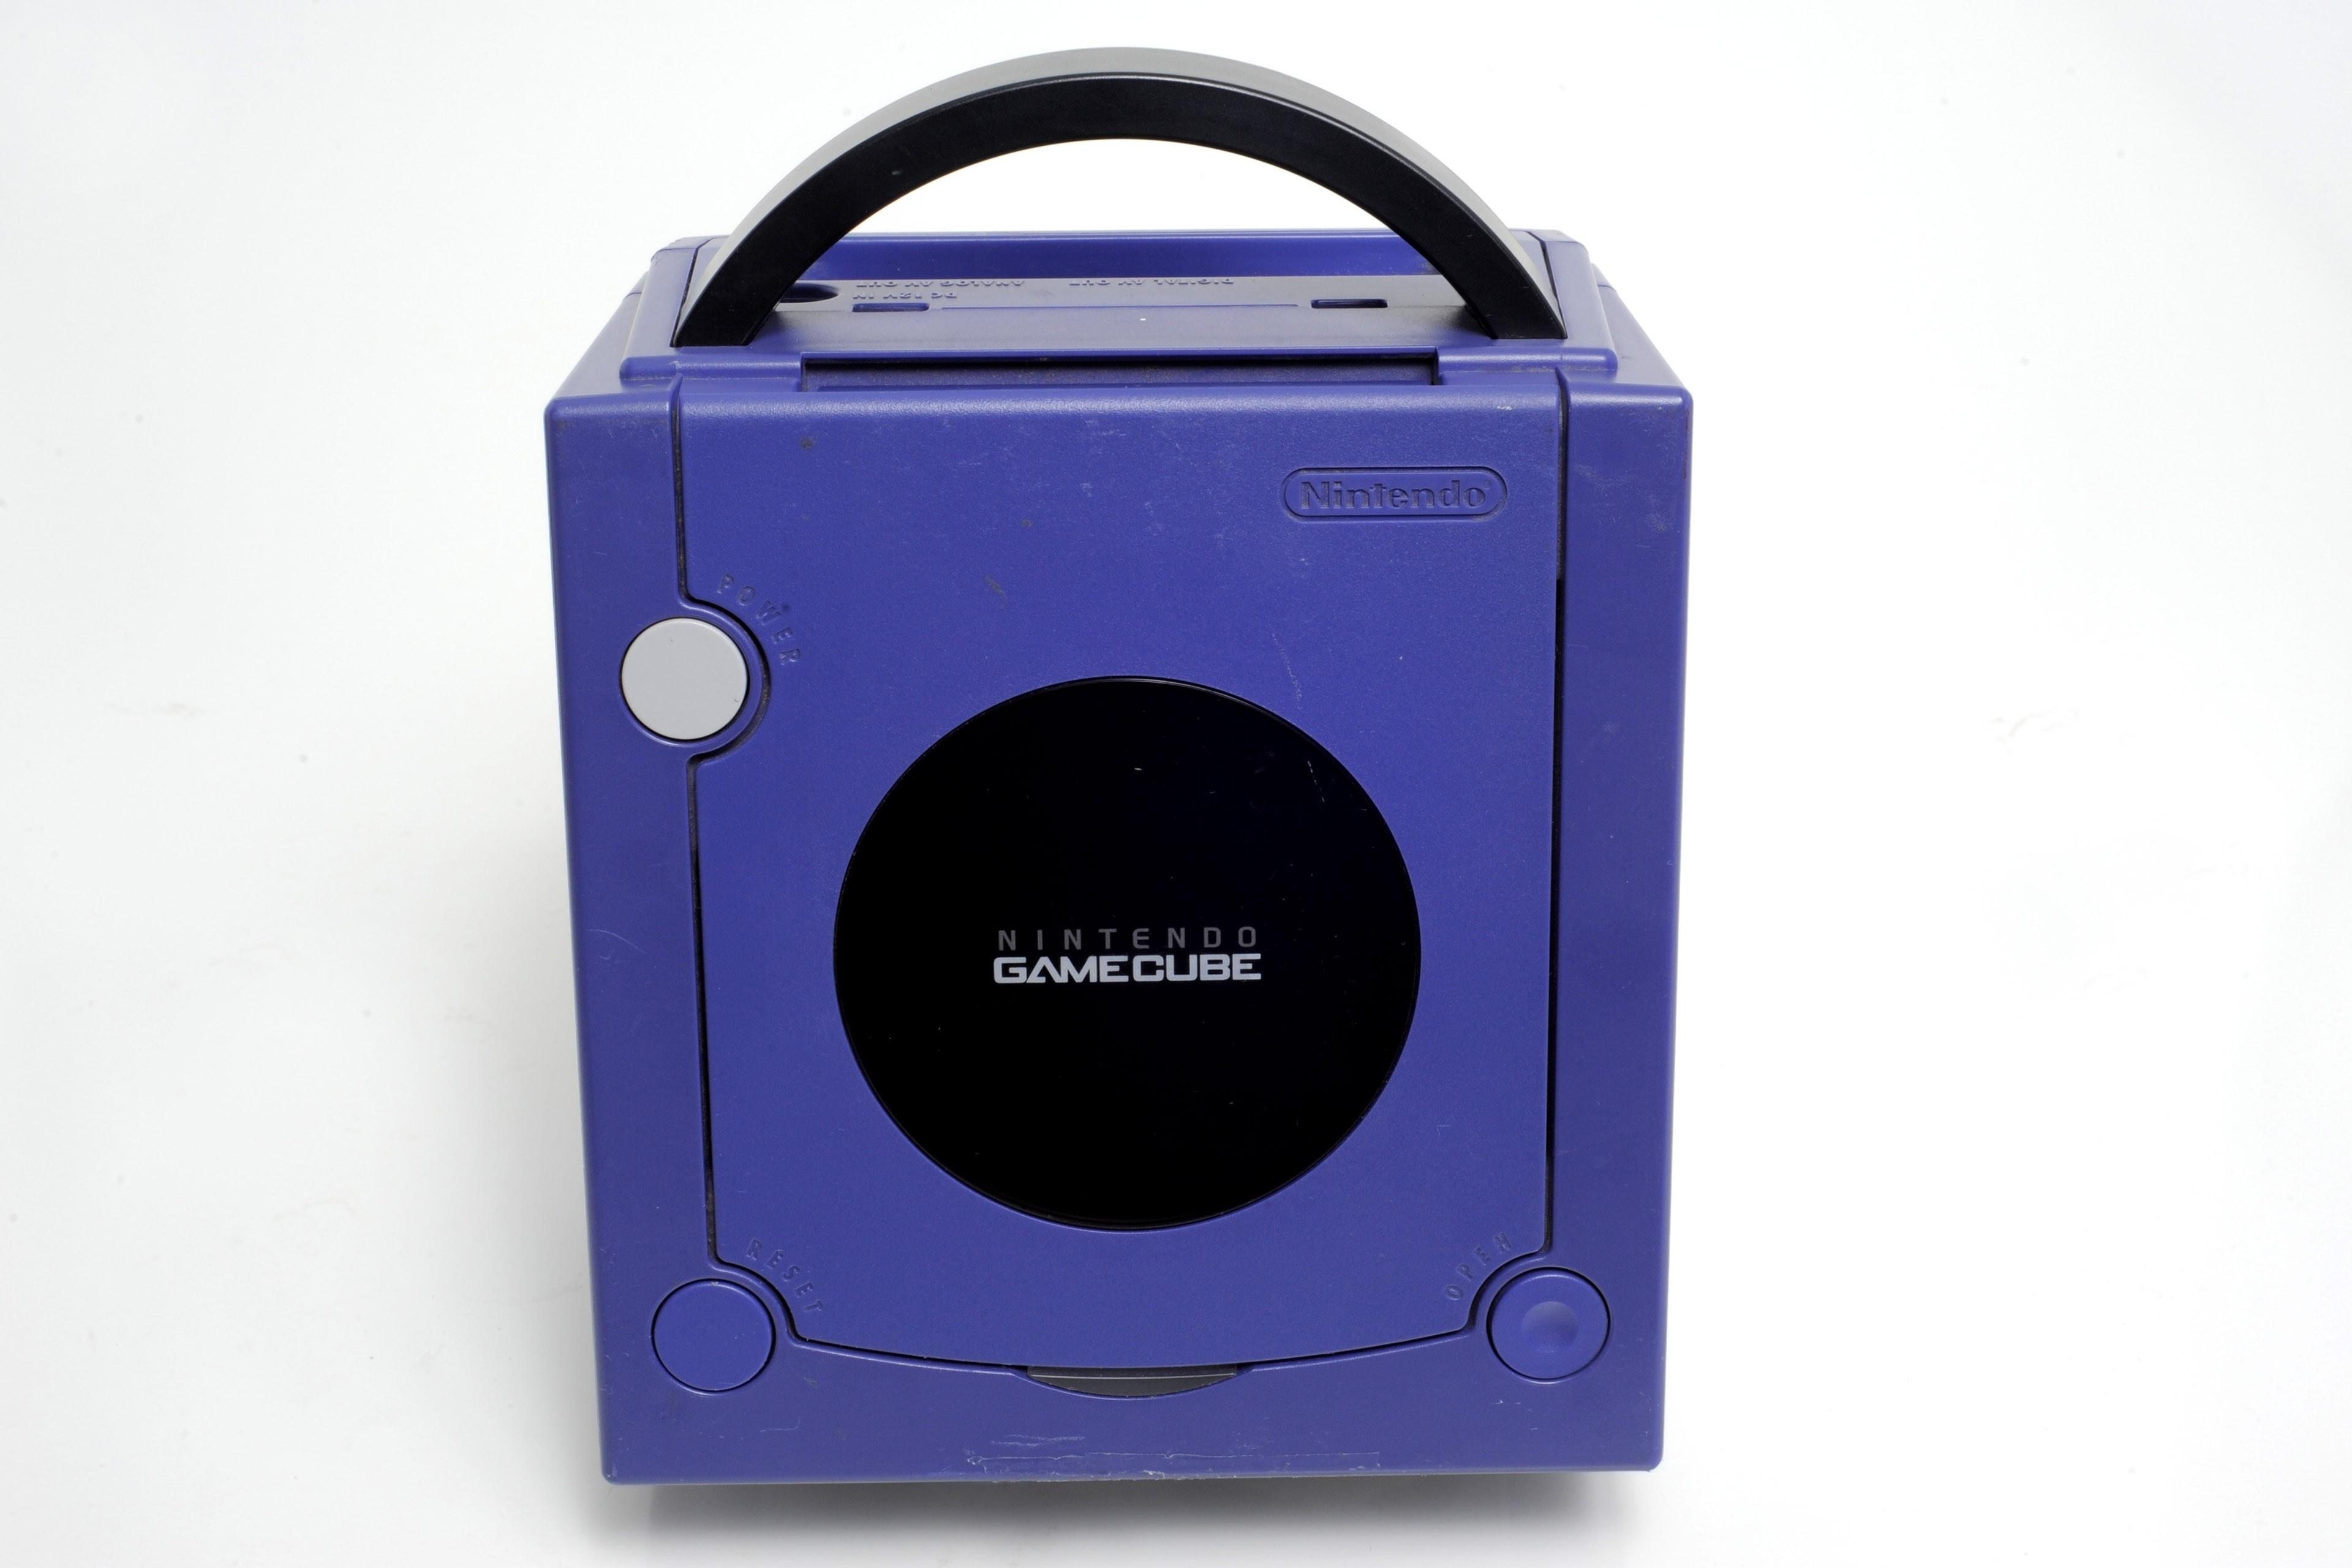 Console Nintendo GameCube indigo sans fil ni manette remise à neuf